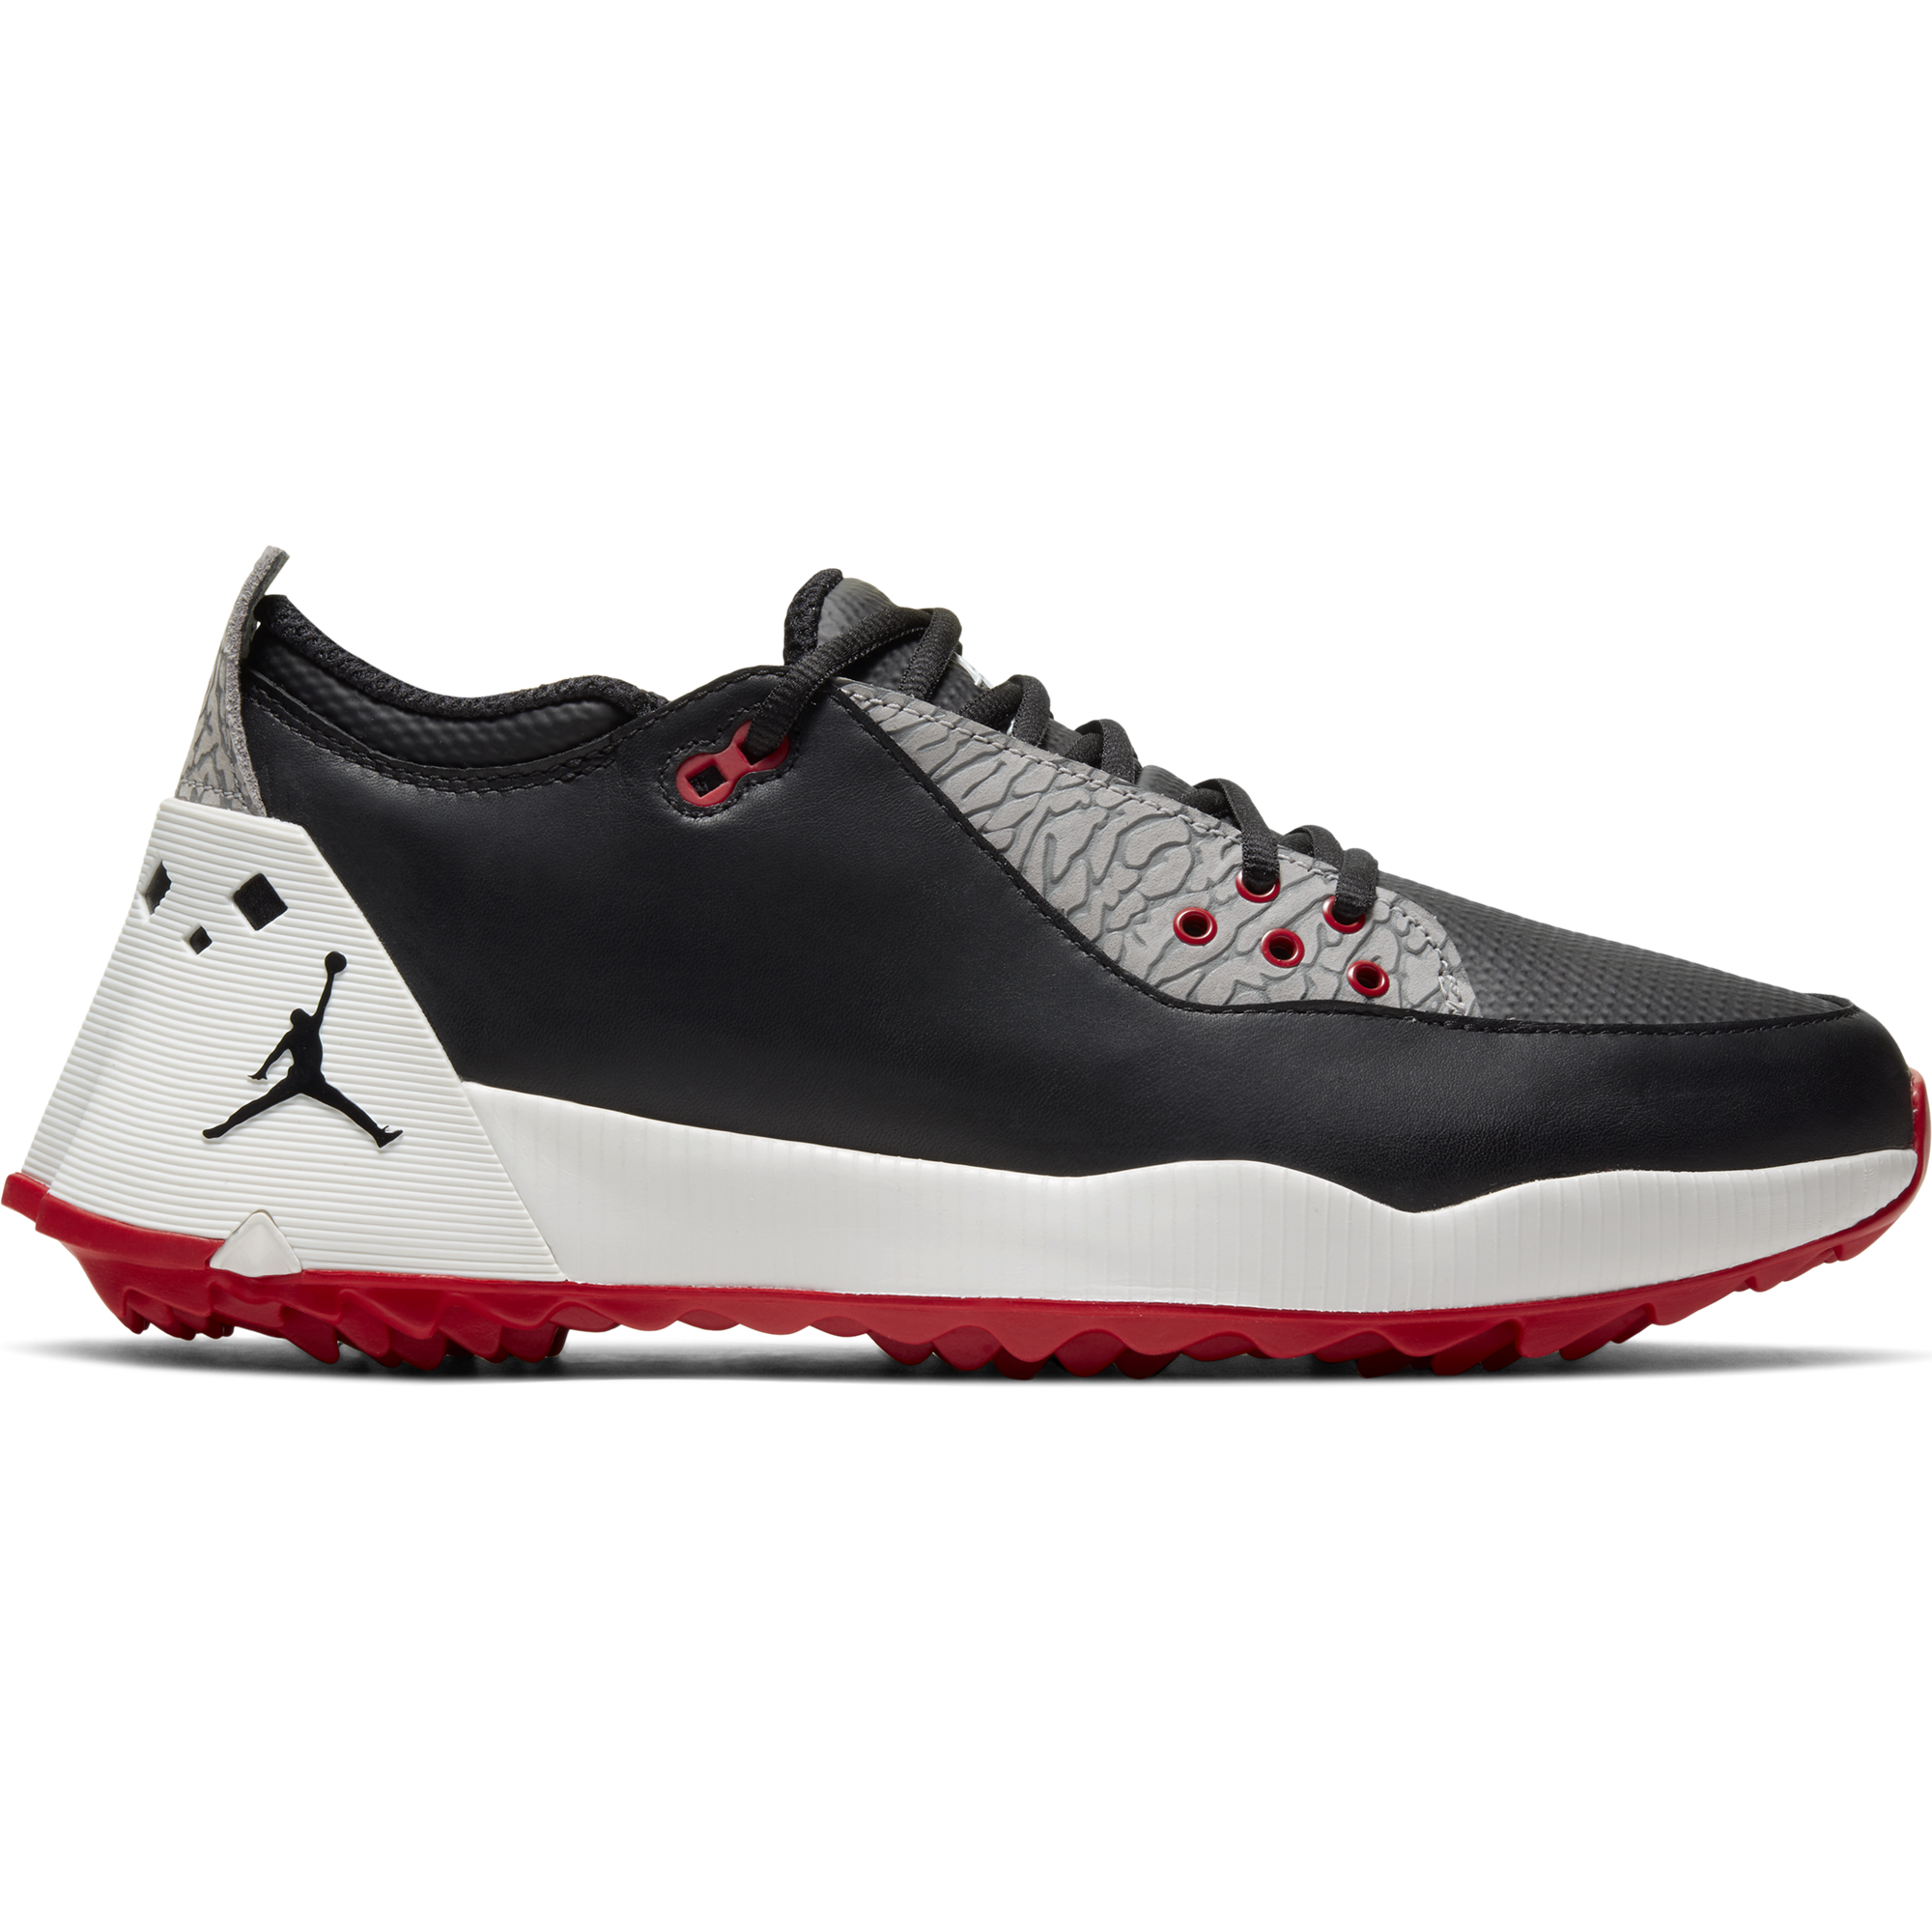 Jordan Adg 2 Men S Golf Shoe Black White Pga Tour Superstore